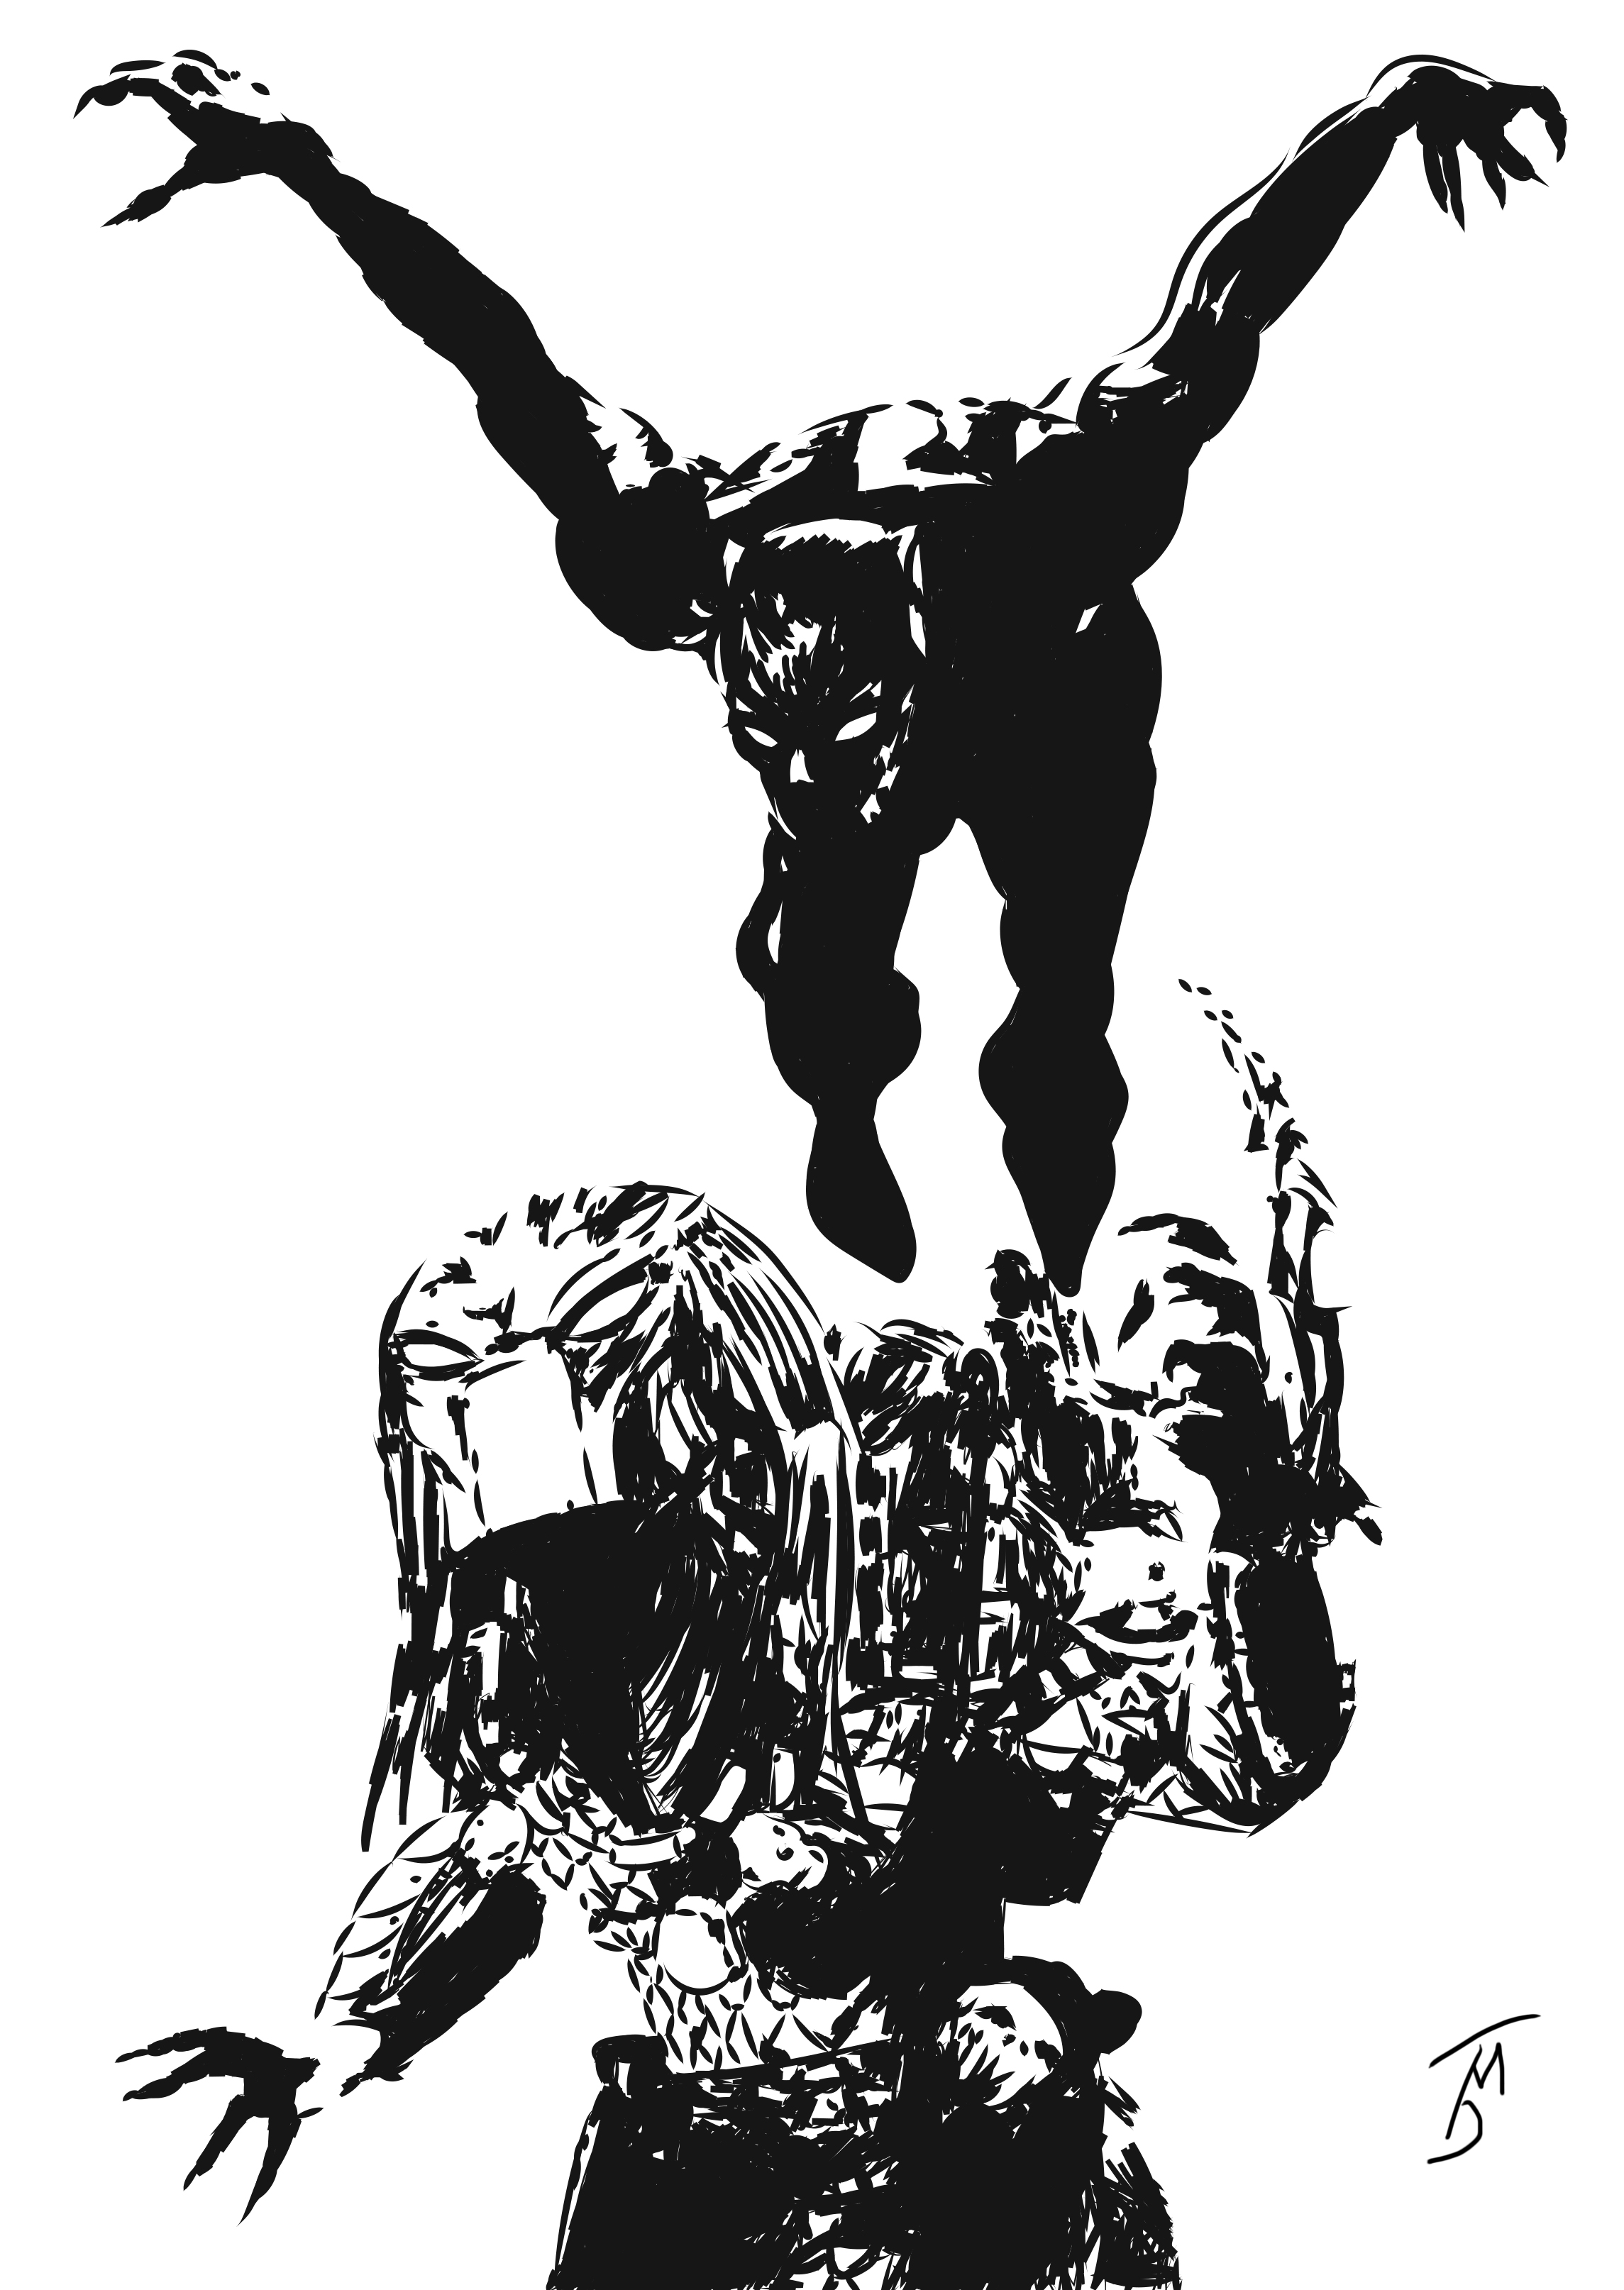 Black Panther Vs. The Predator